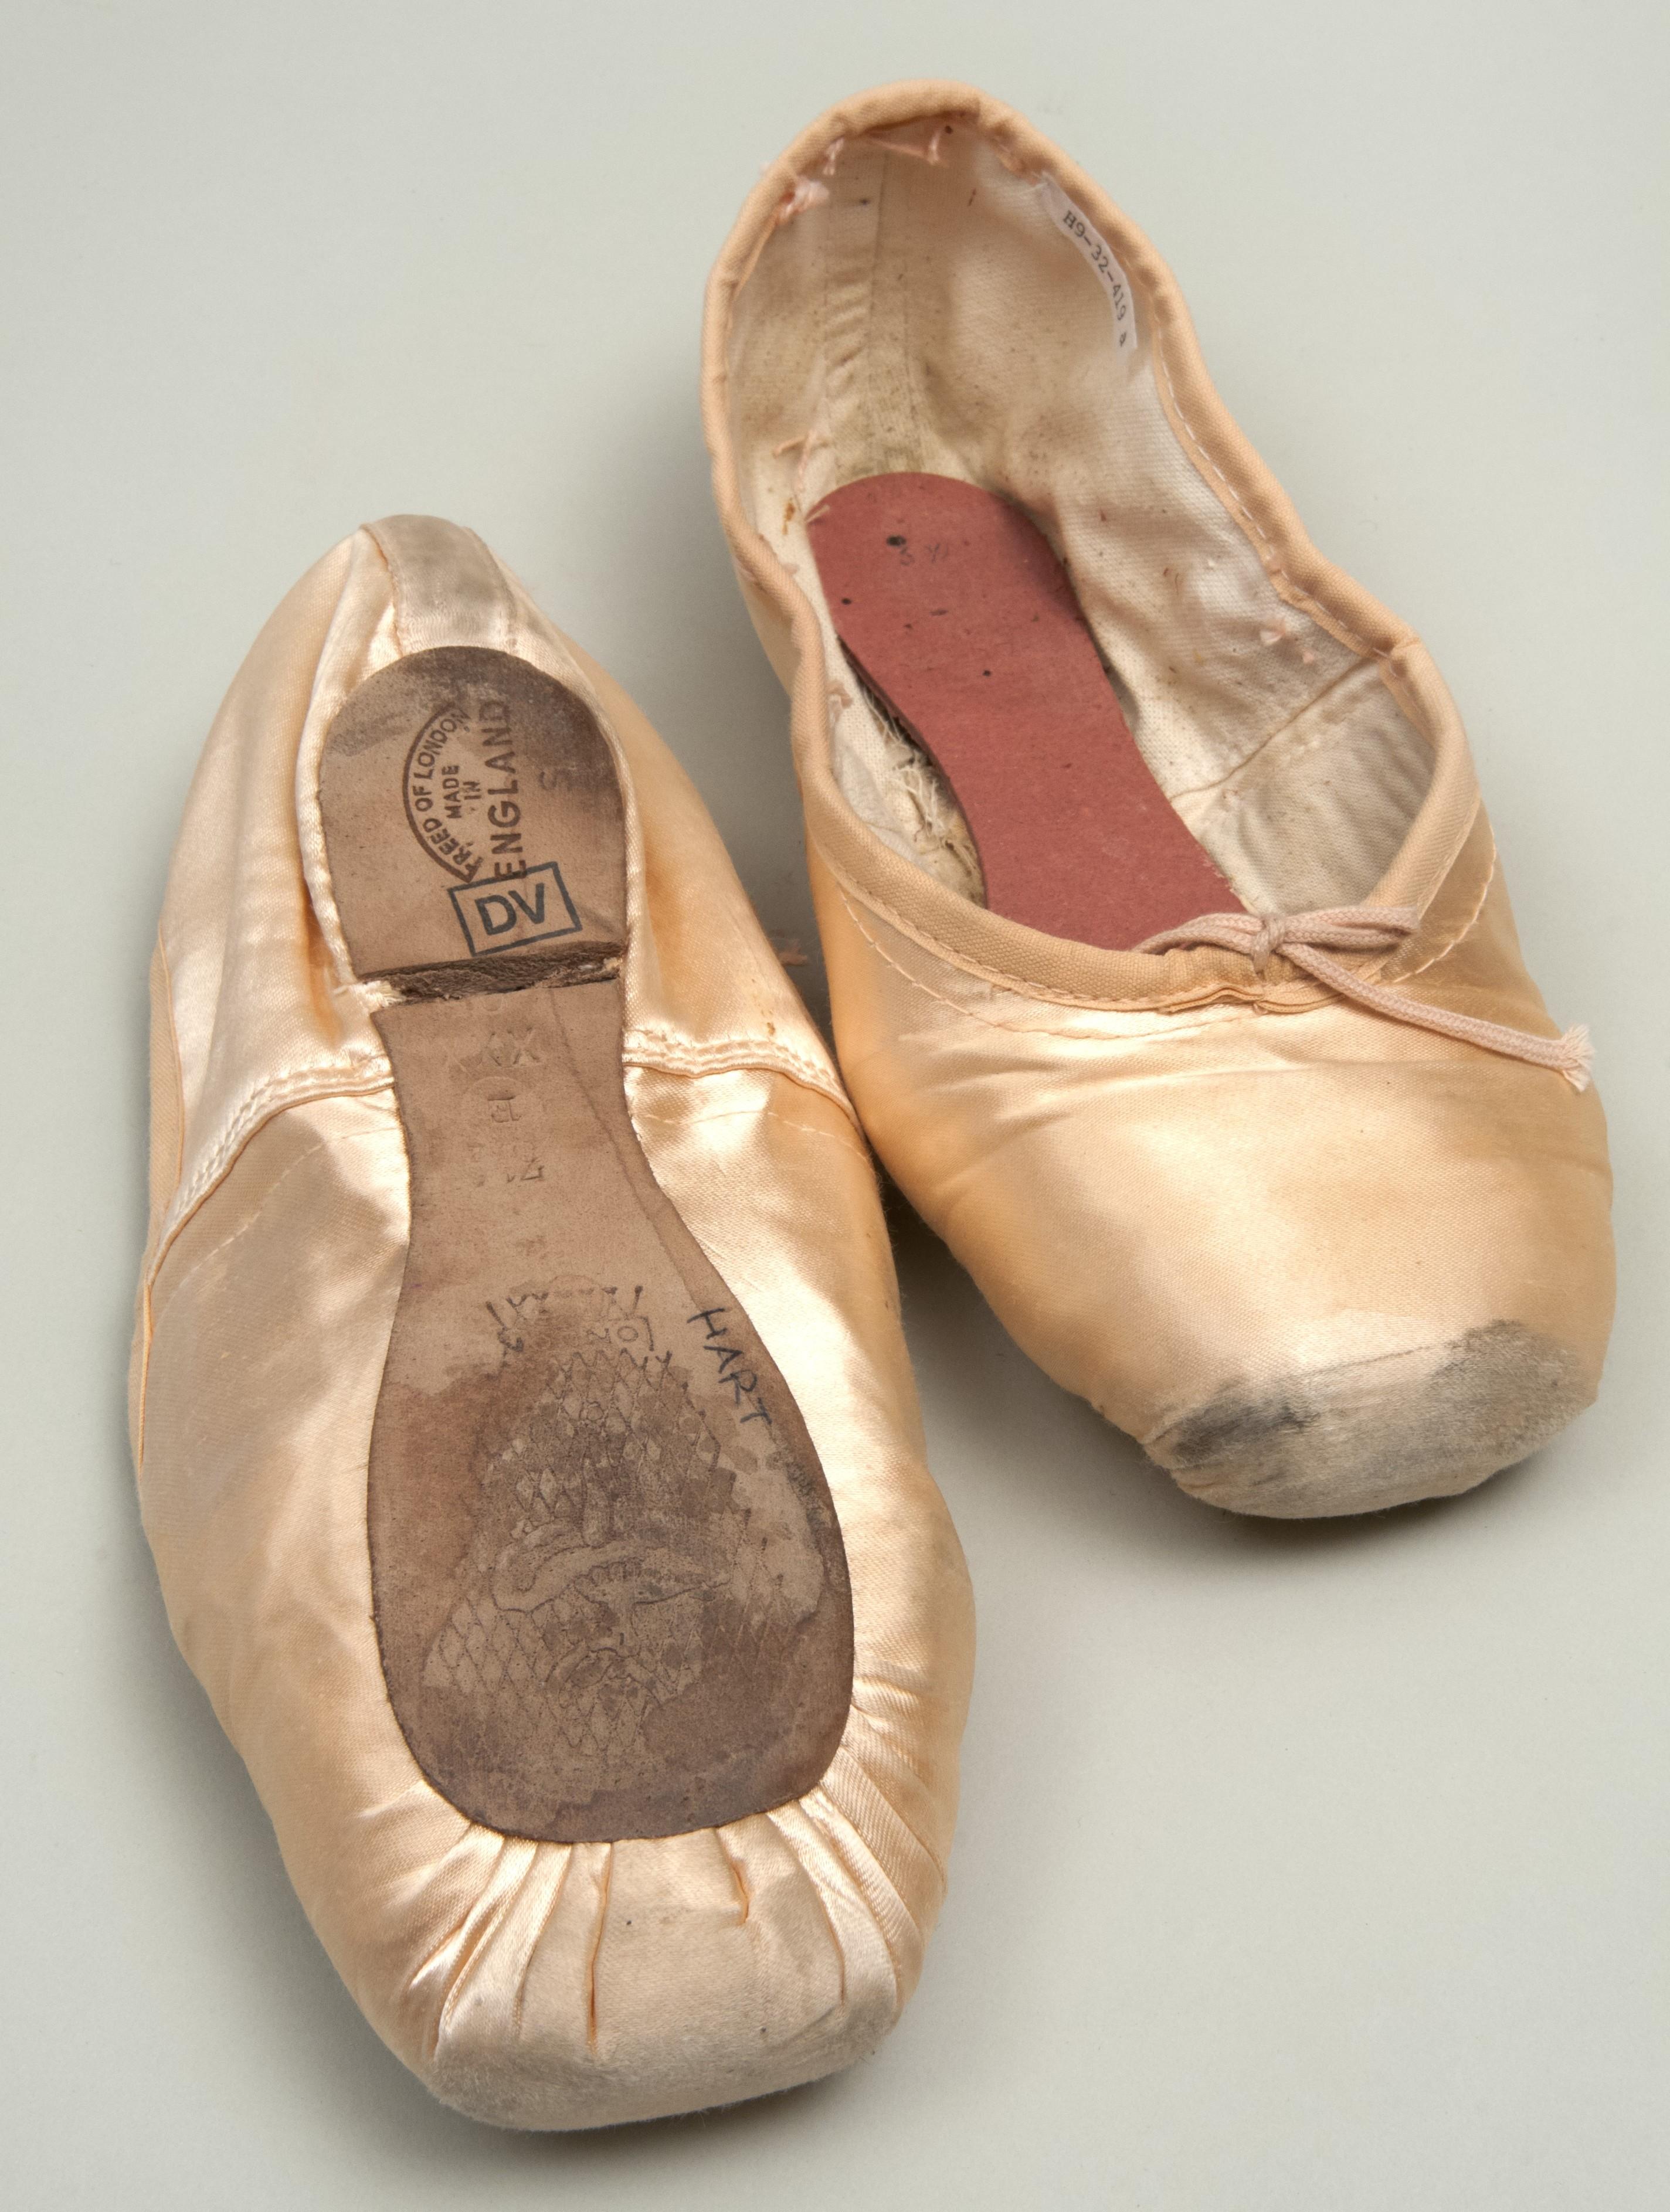 Bloch Pro Arch Leather Ballet Shoes